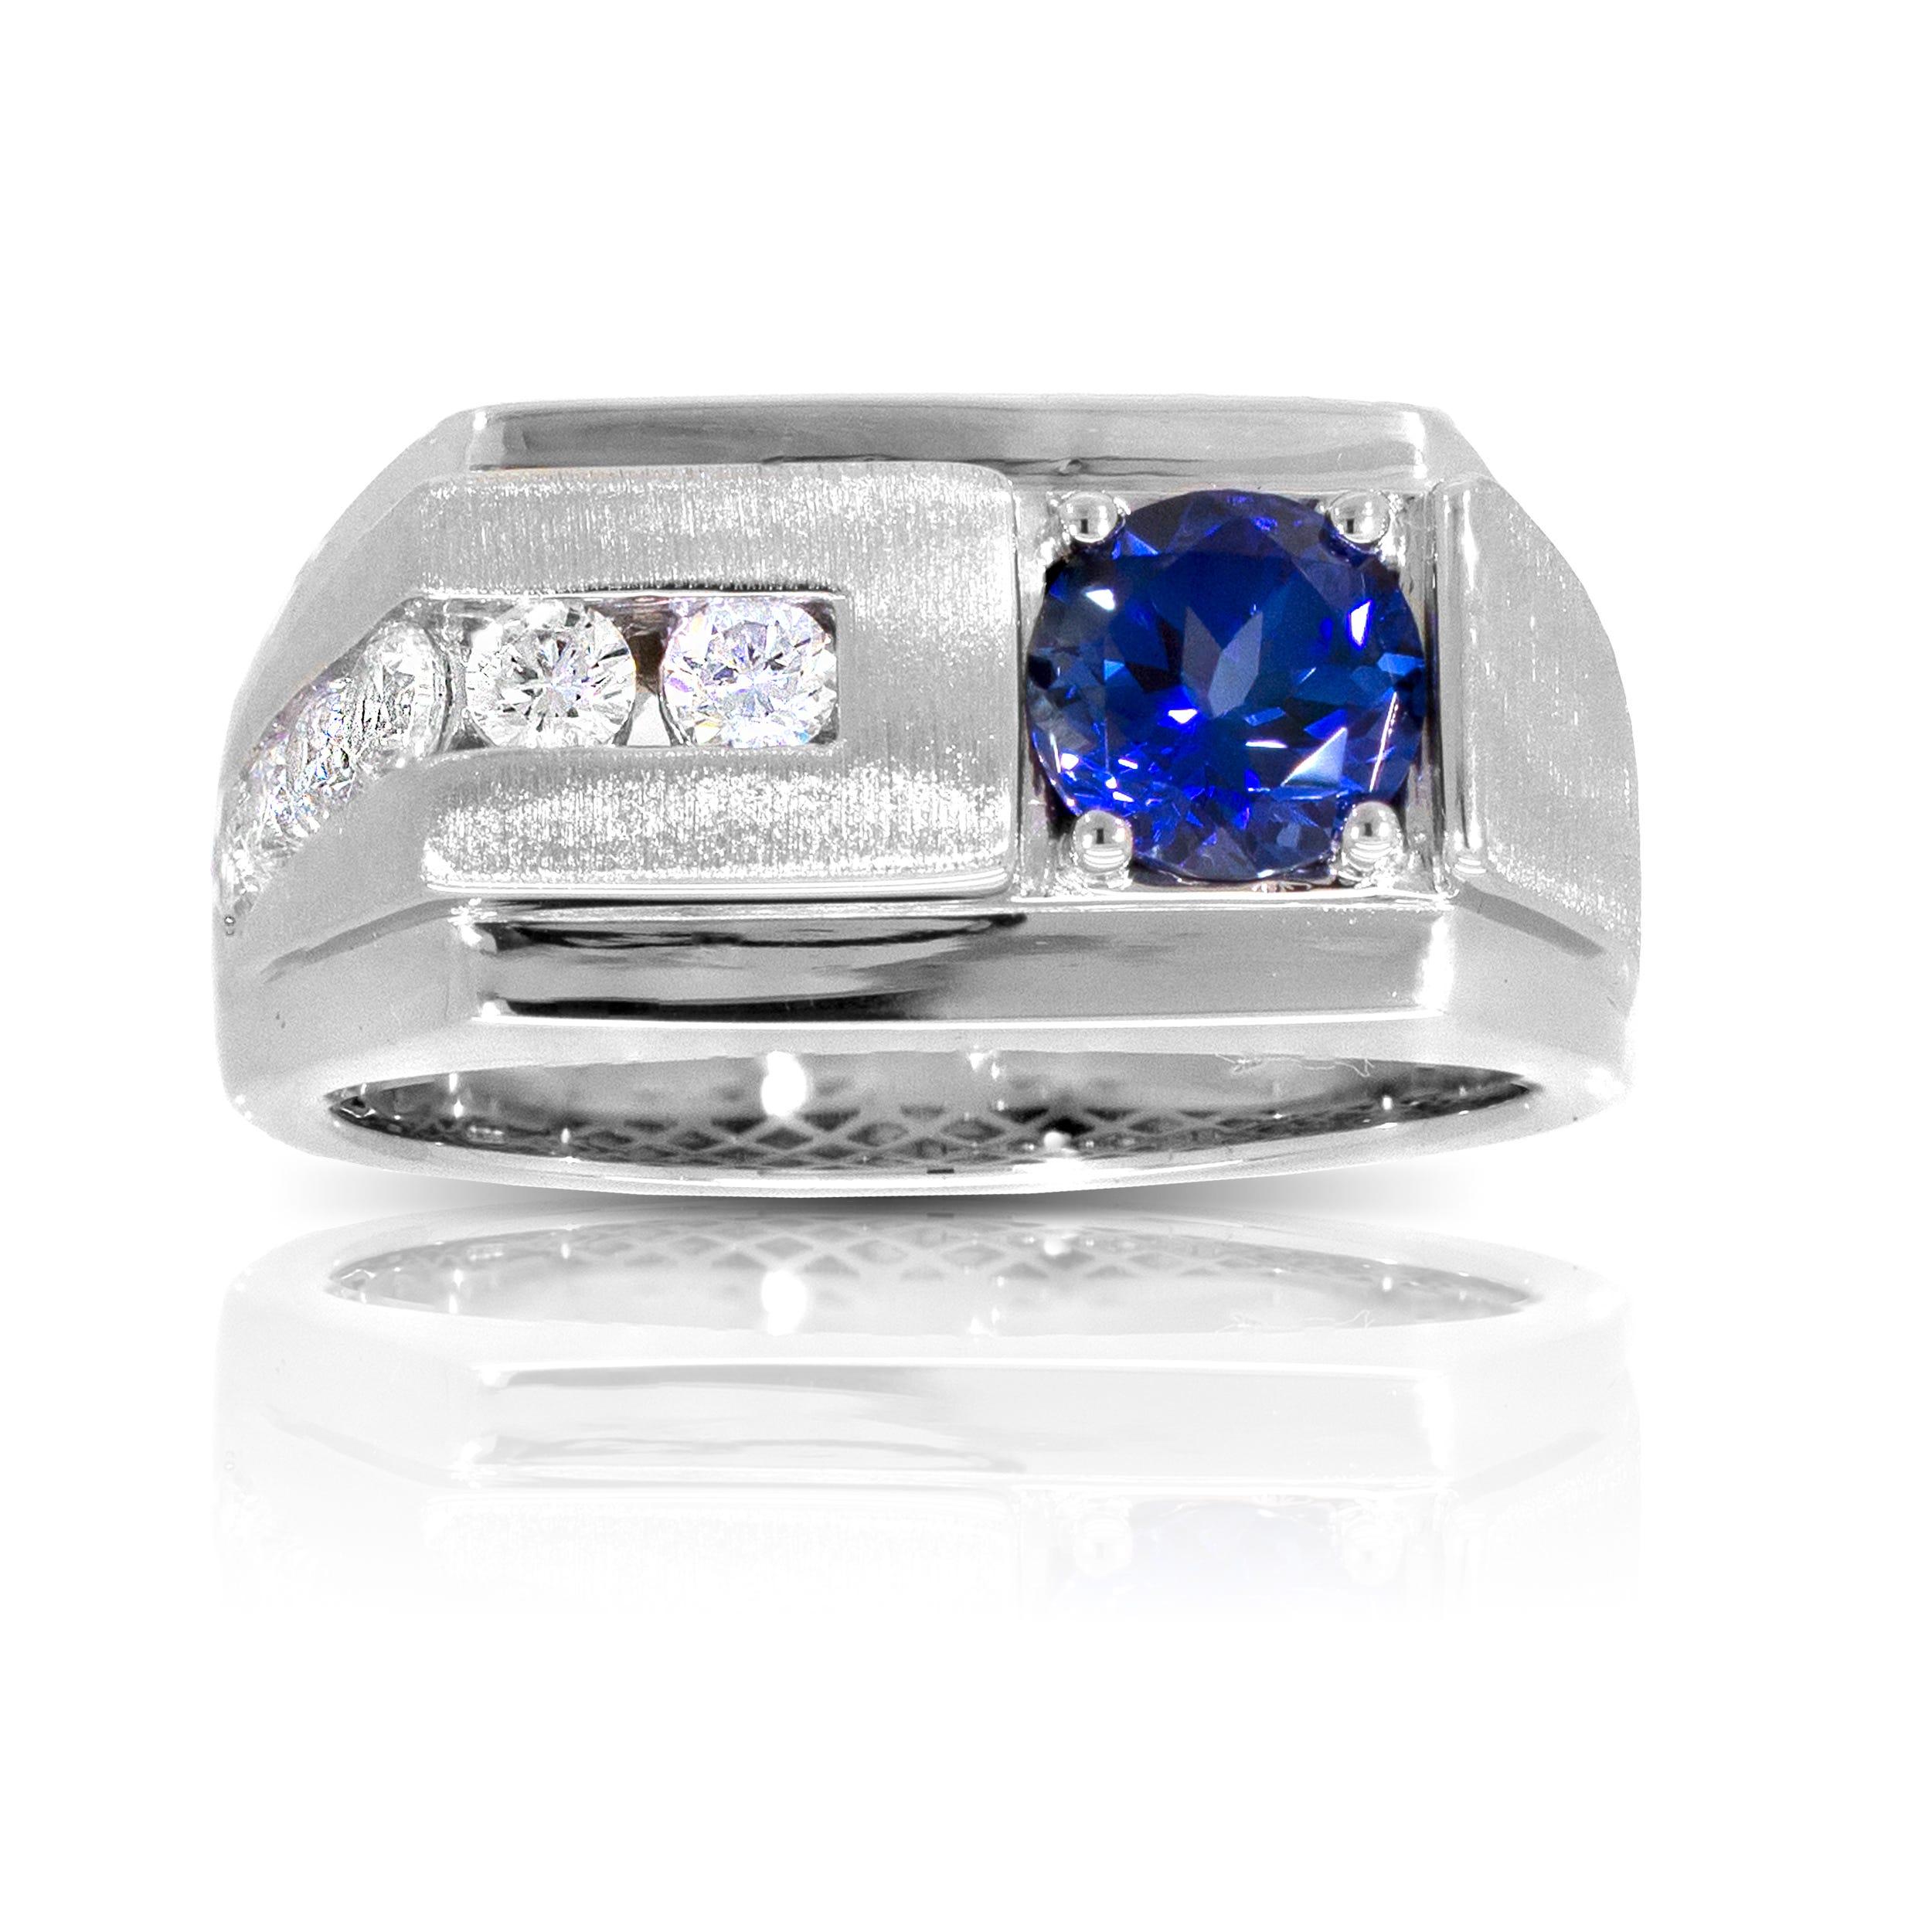 Men's Round Created Sapphire & Diamond Ring in 10k White Gold